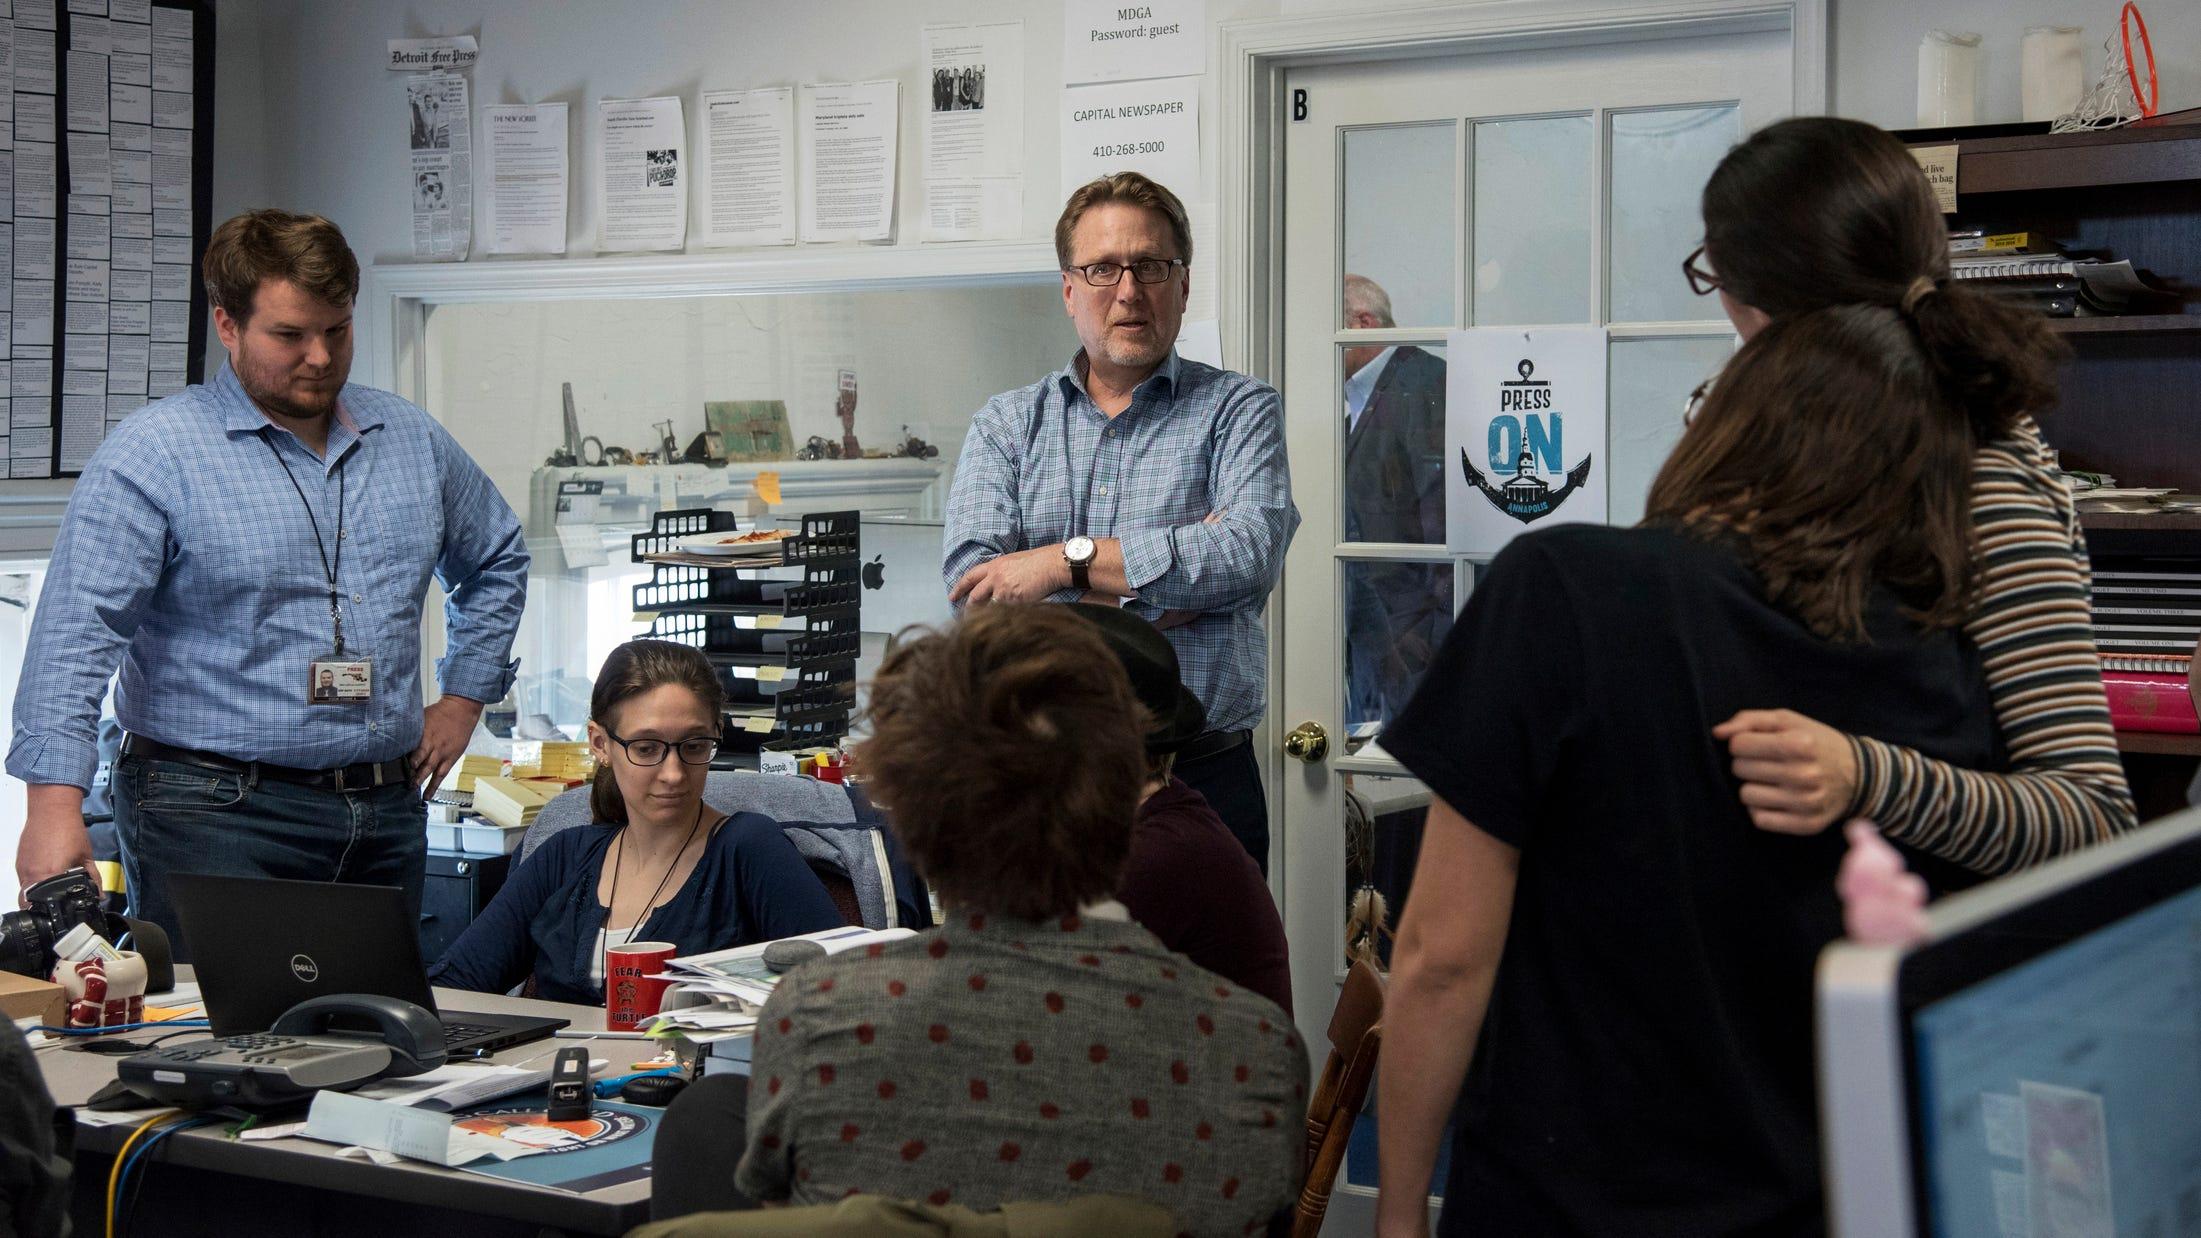 Editor of paper that endured newsroom shooting says goodbye 2